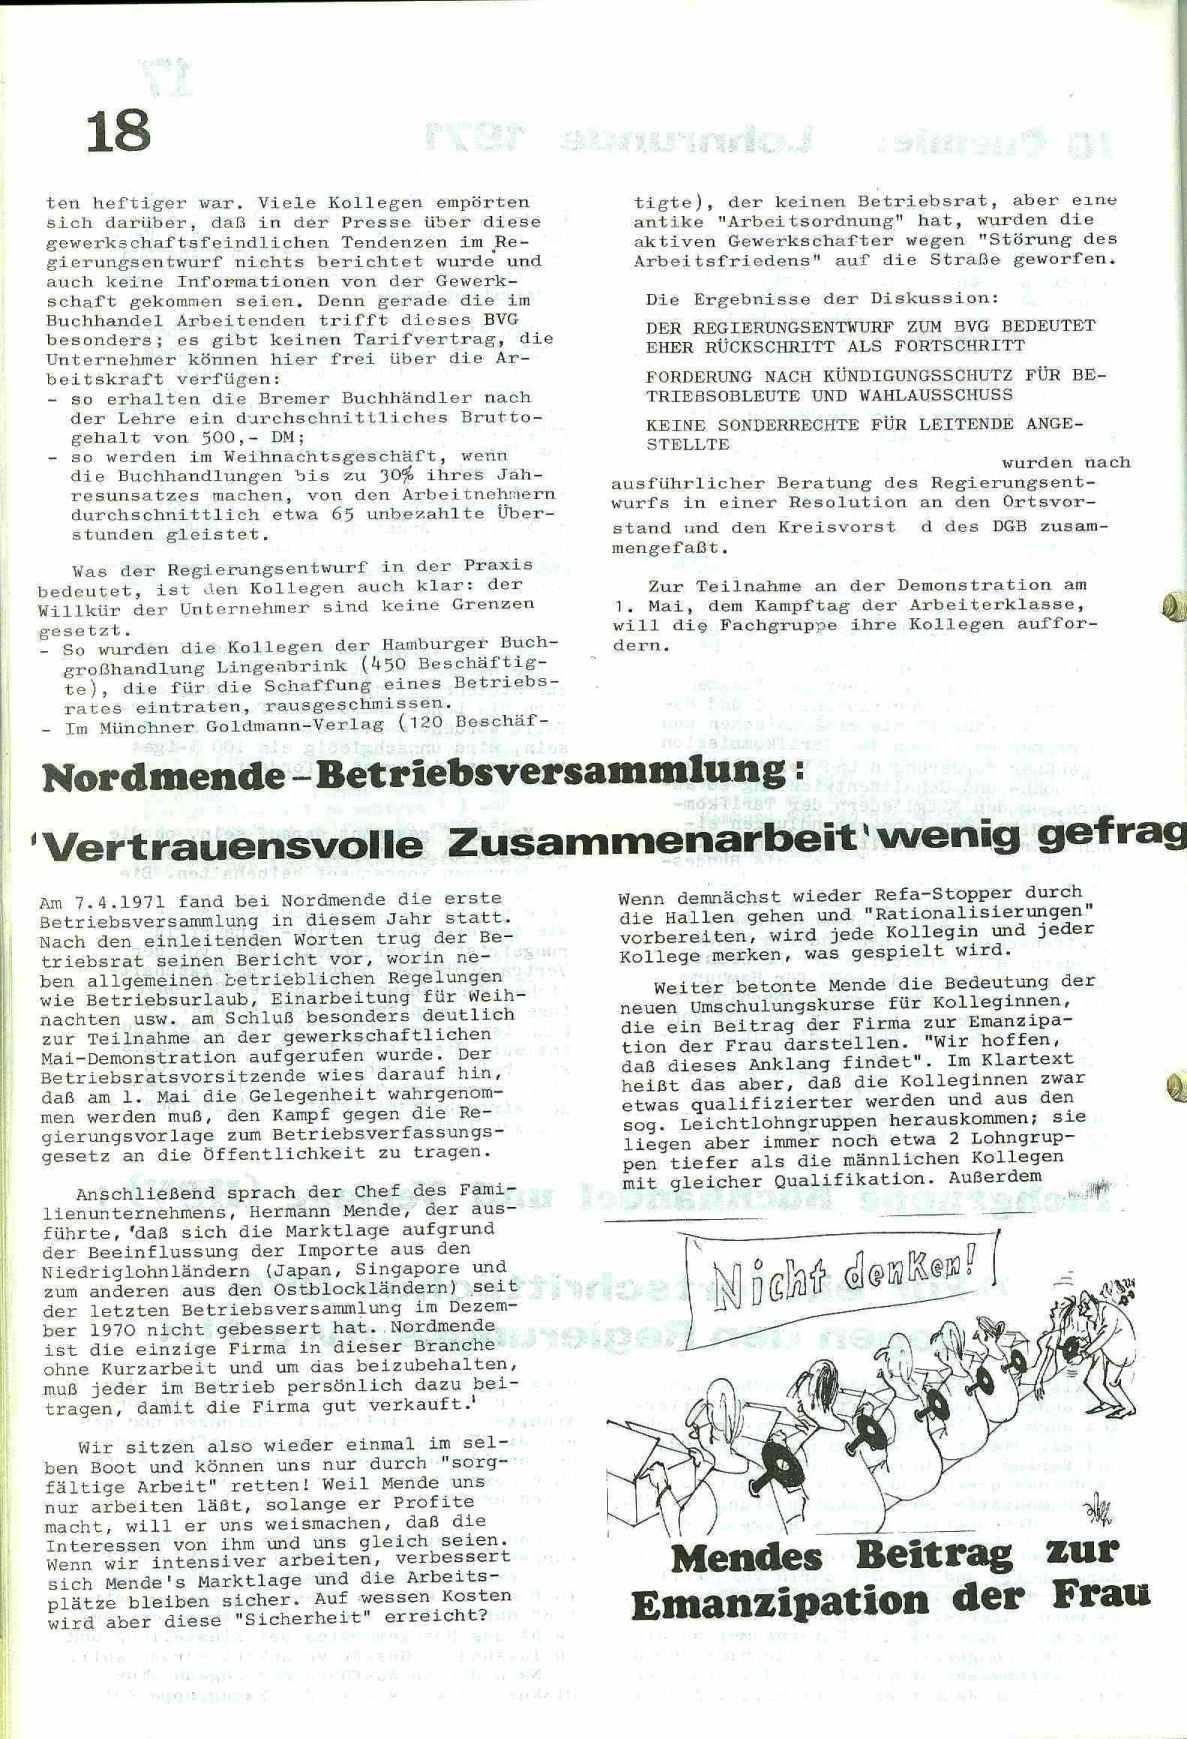 Bremen_KAK084